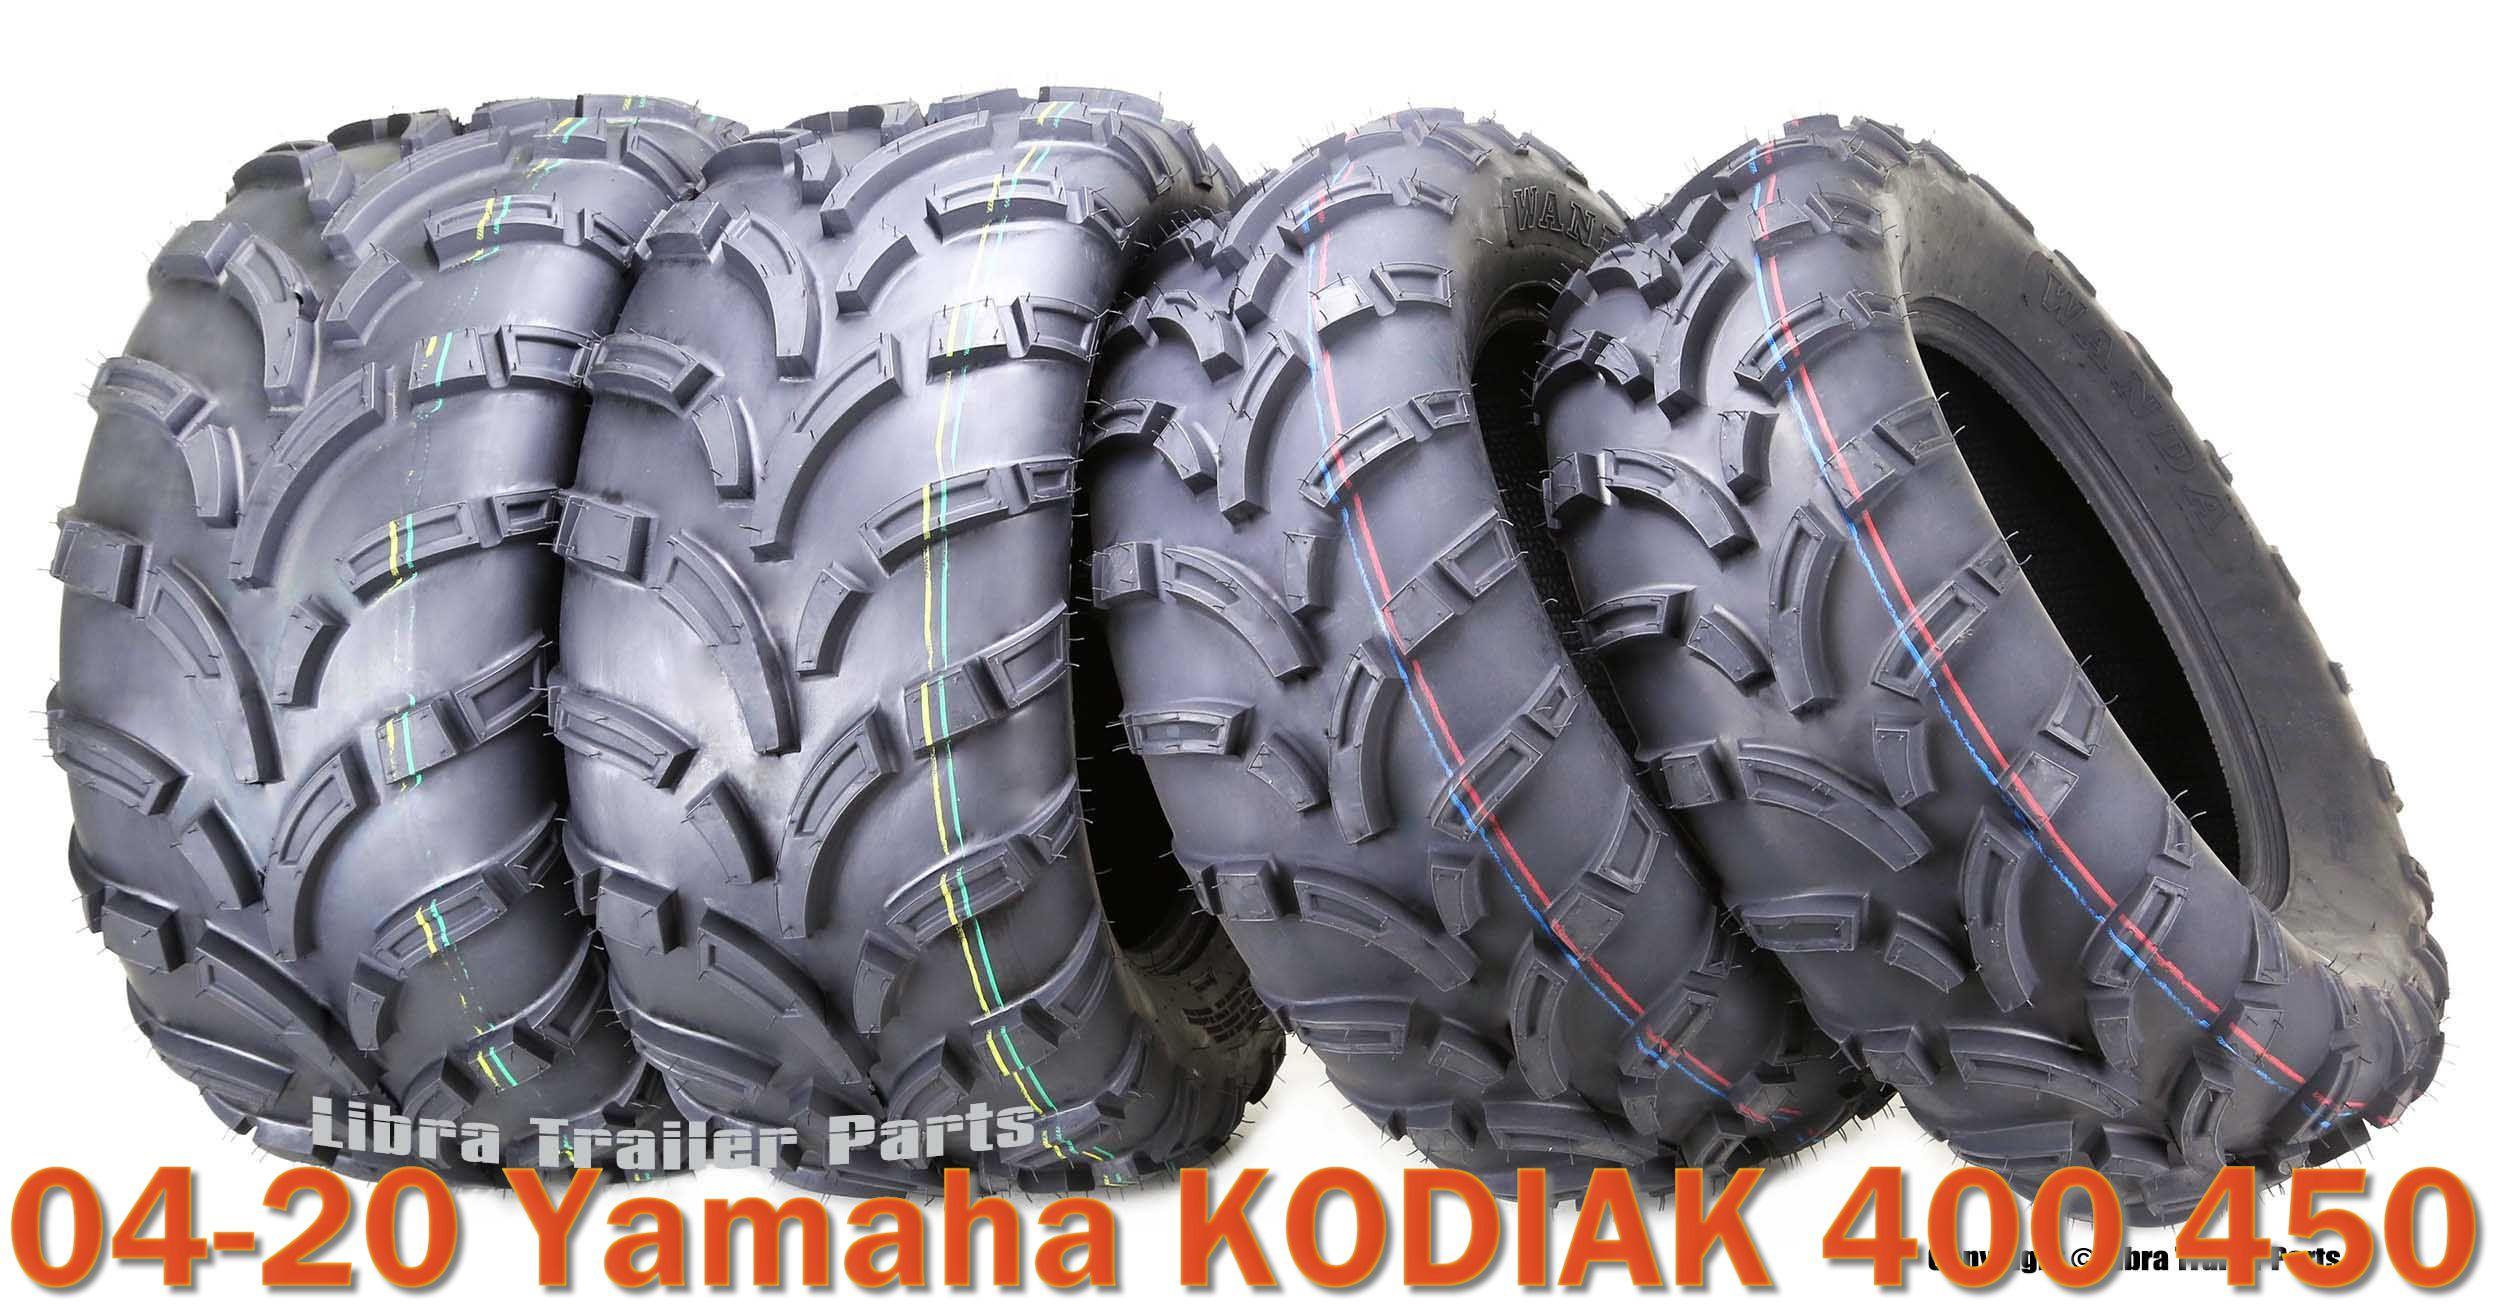 Set of 4 WANDA ATV//UTV Tires 25X8-12 25X10-12 for 1993-2006 YAMAHA KODIAK 450